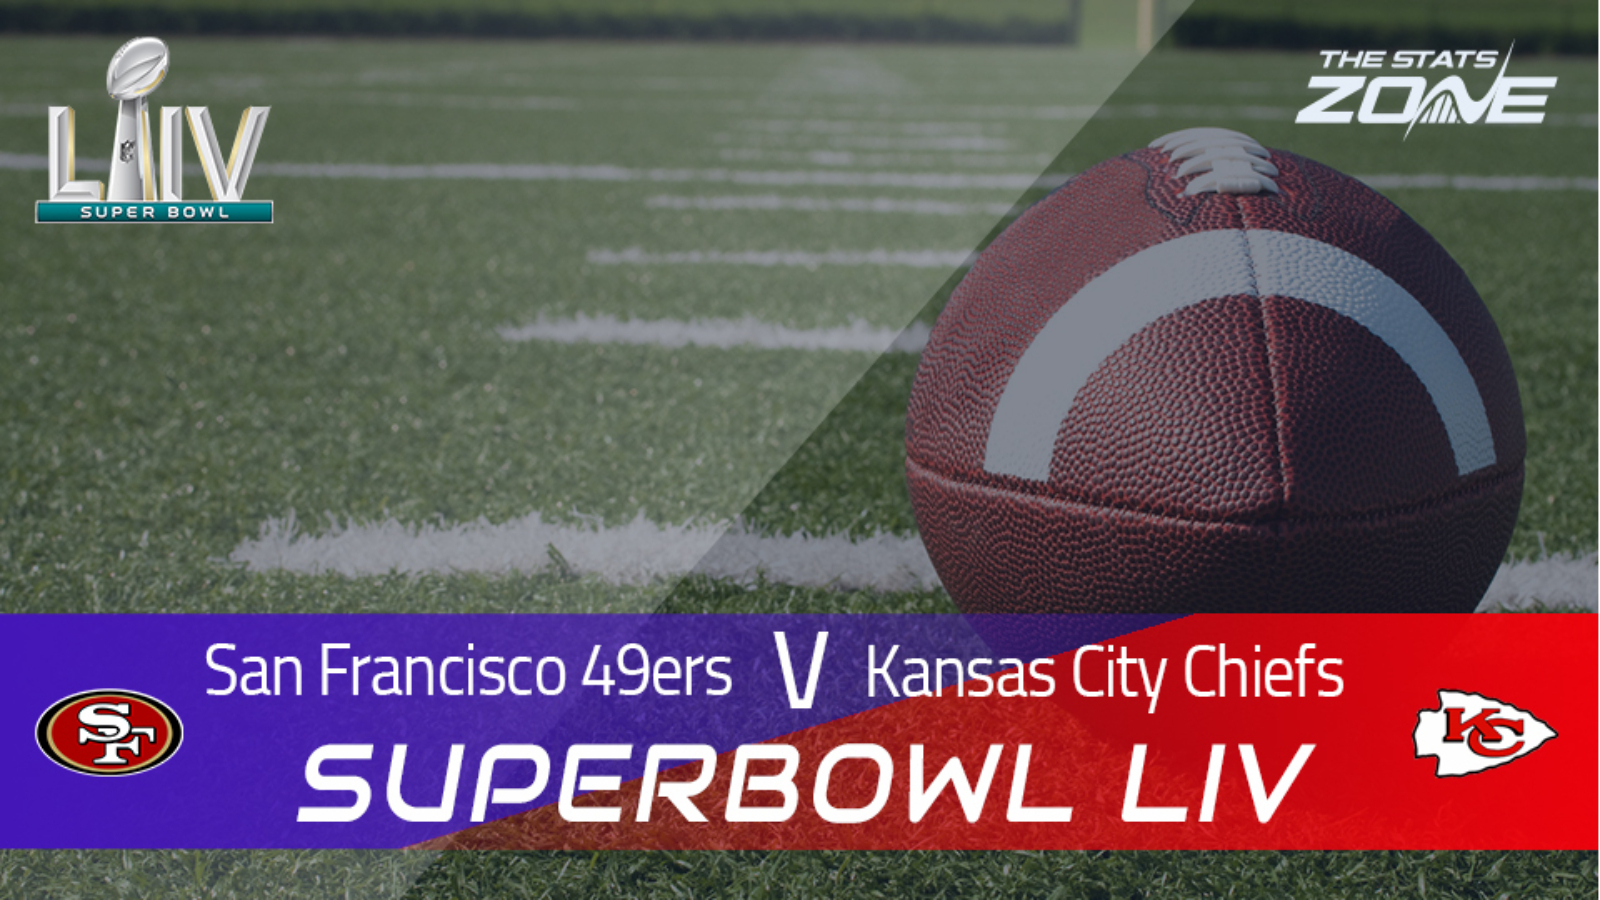 Super Bowl LIV San Francisco 49ers vs Kansas City Chiefs Preview 1600x900